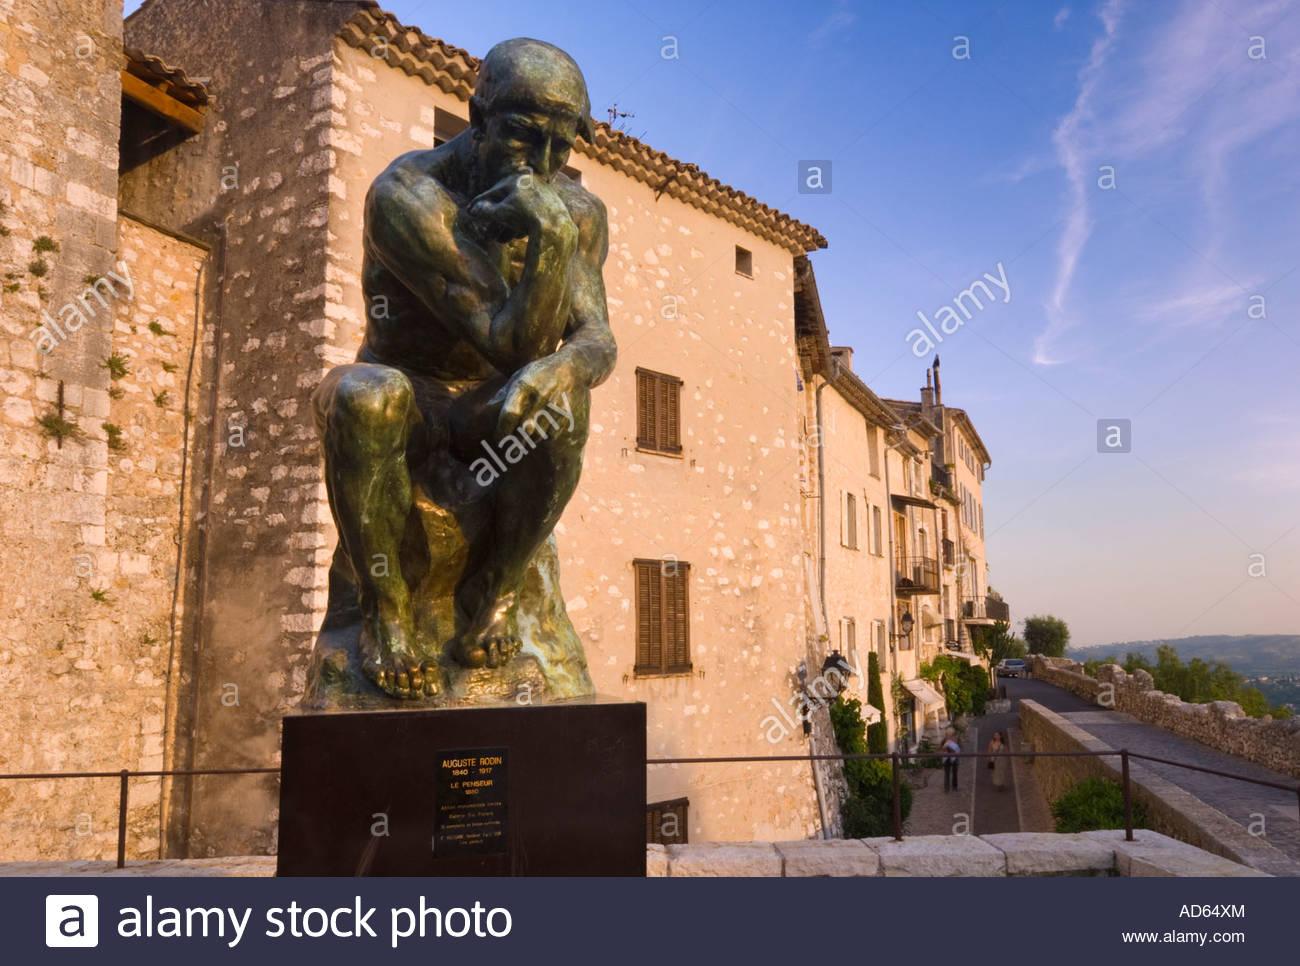 Replica statue of Rodin's 'The Thinker' in St Paul De Vence, near Nice, Côte d'Azur, France - Stock Image